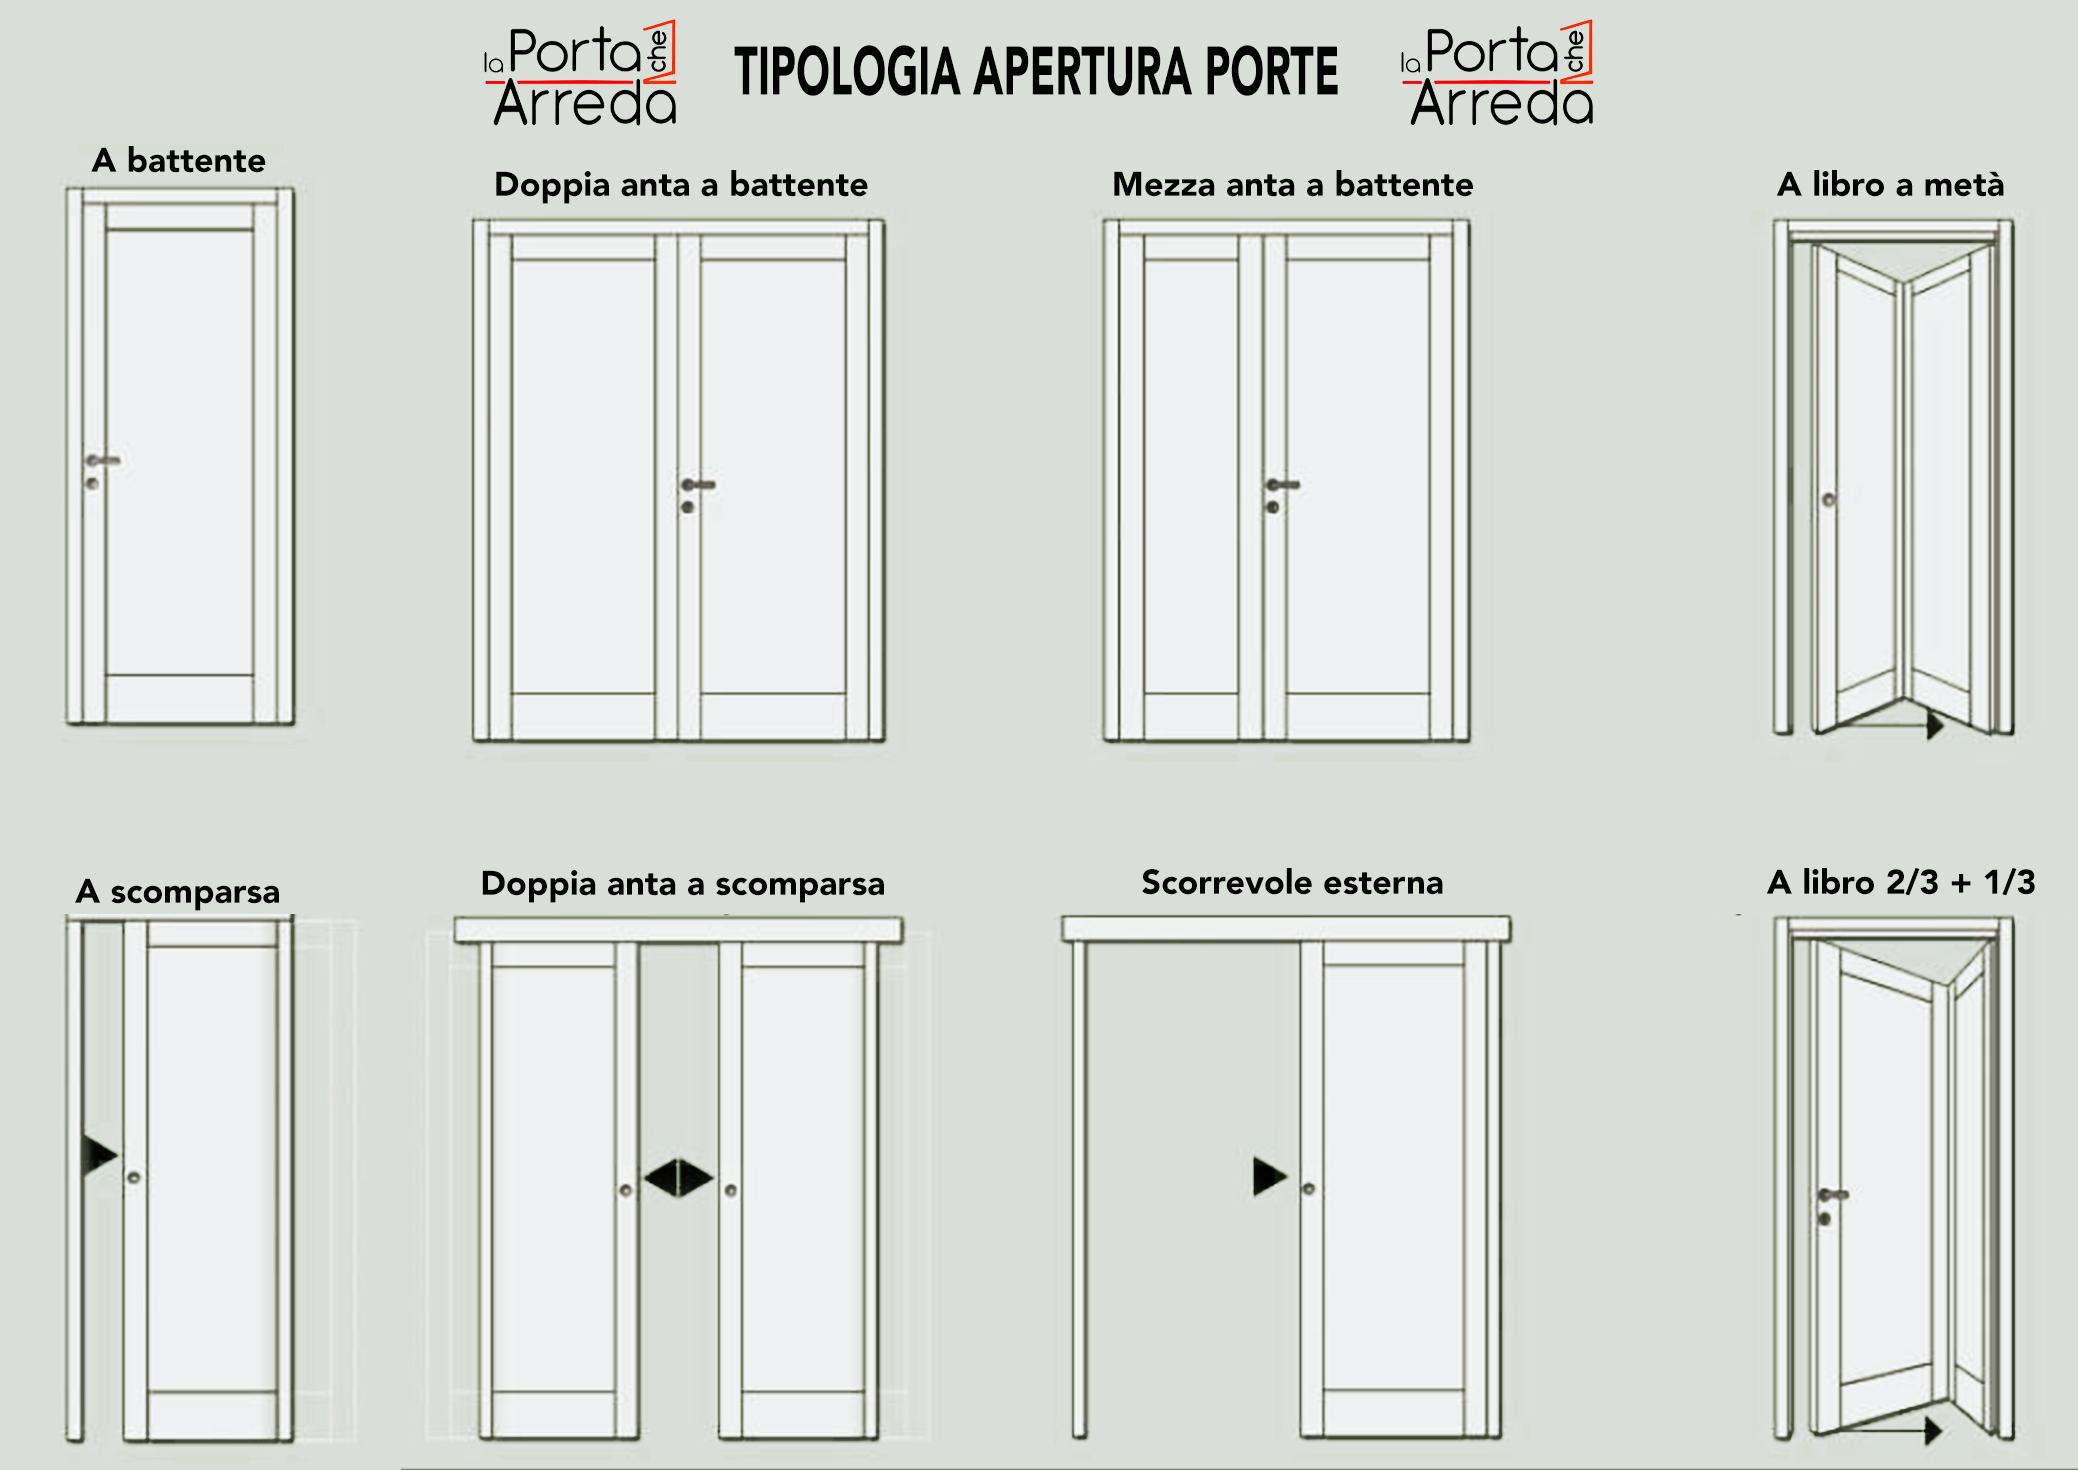 tipologia apertura porte artigianali la porta che arreda